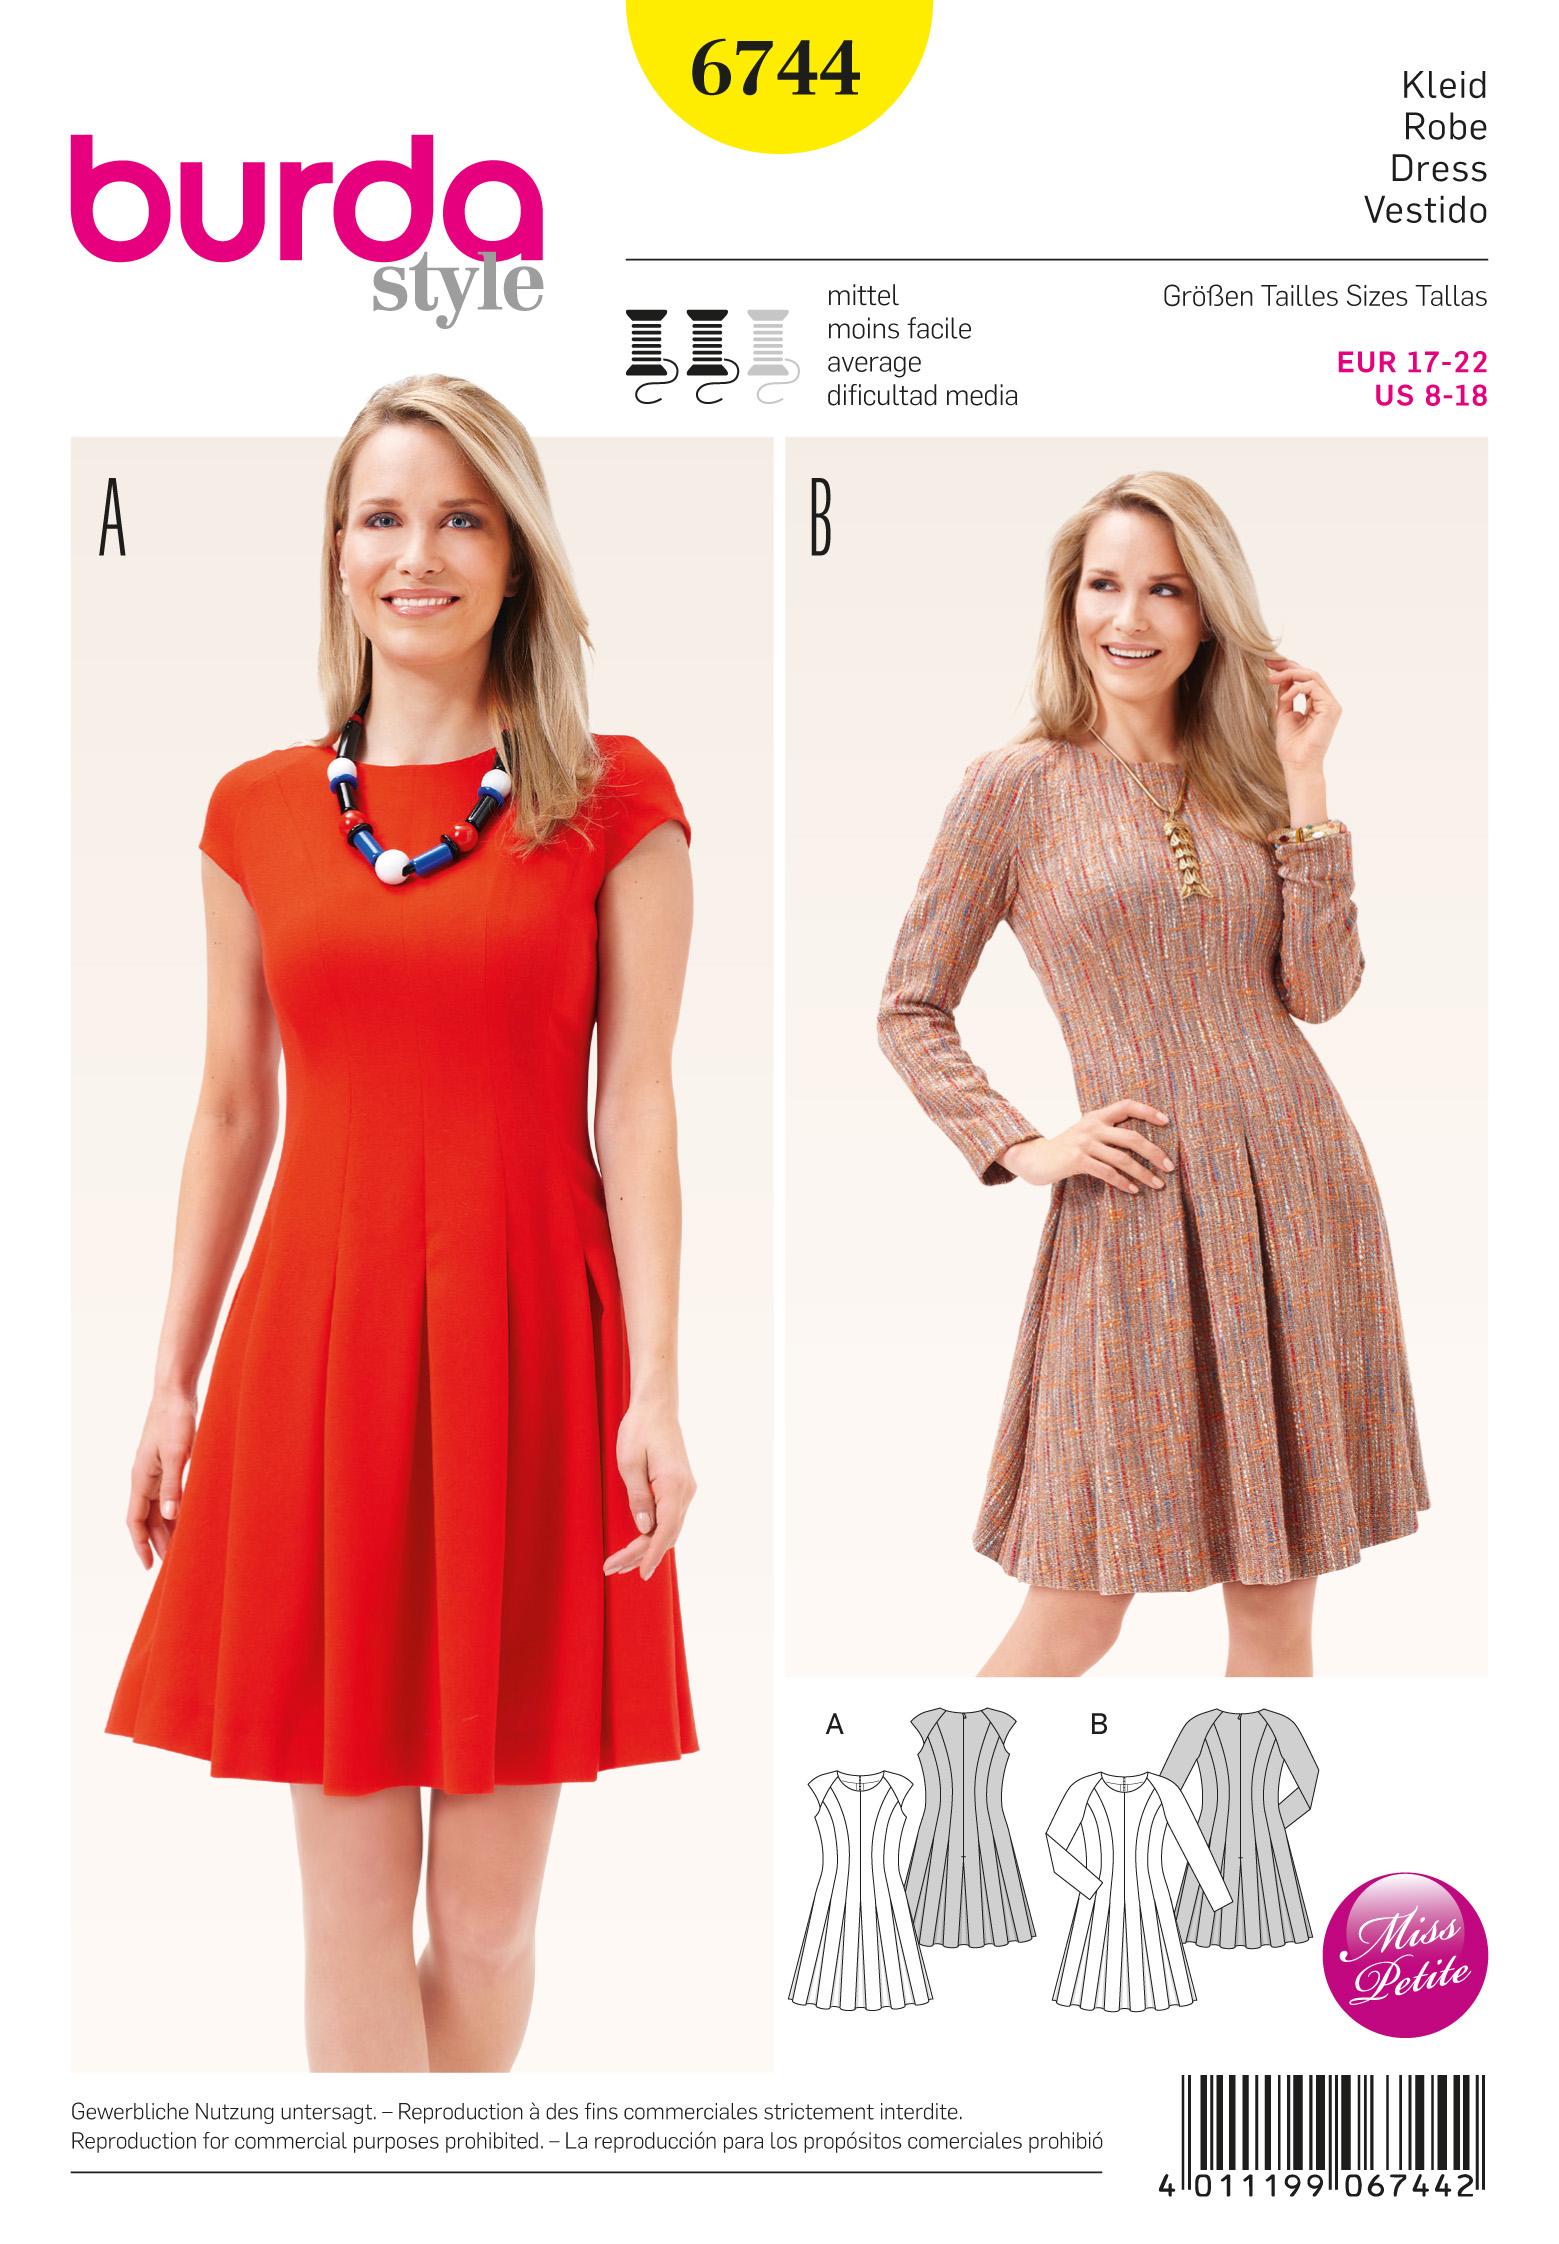 Burda 6744 Misses Dress With Swingy Skirt